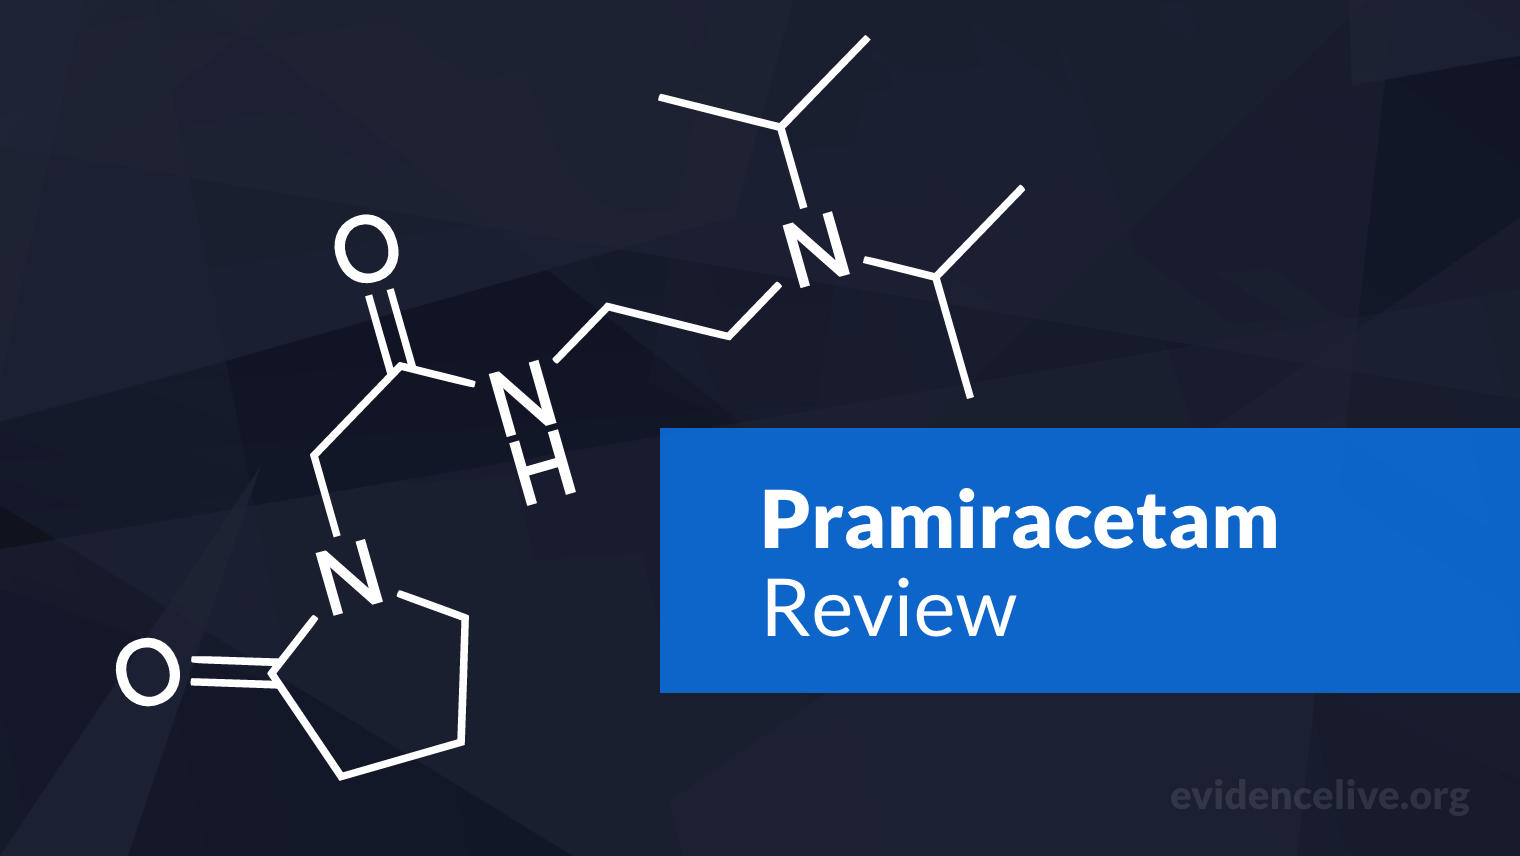 Pramiracetam: Benefits, Uses, Dosage, and Side Effects